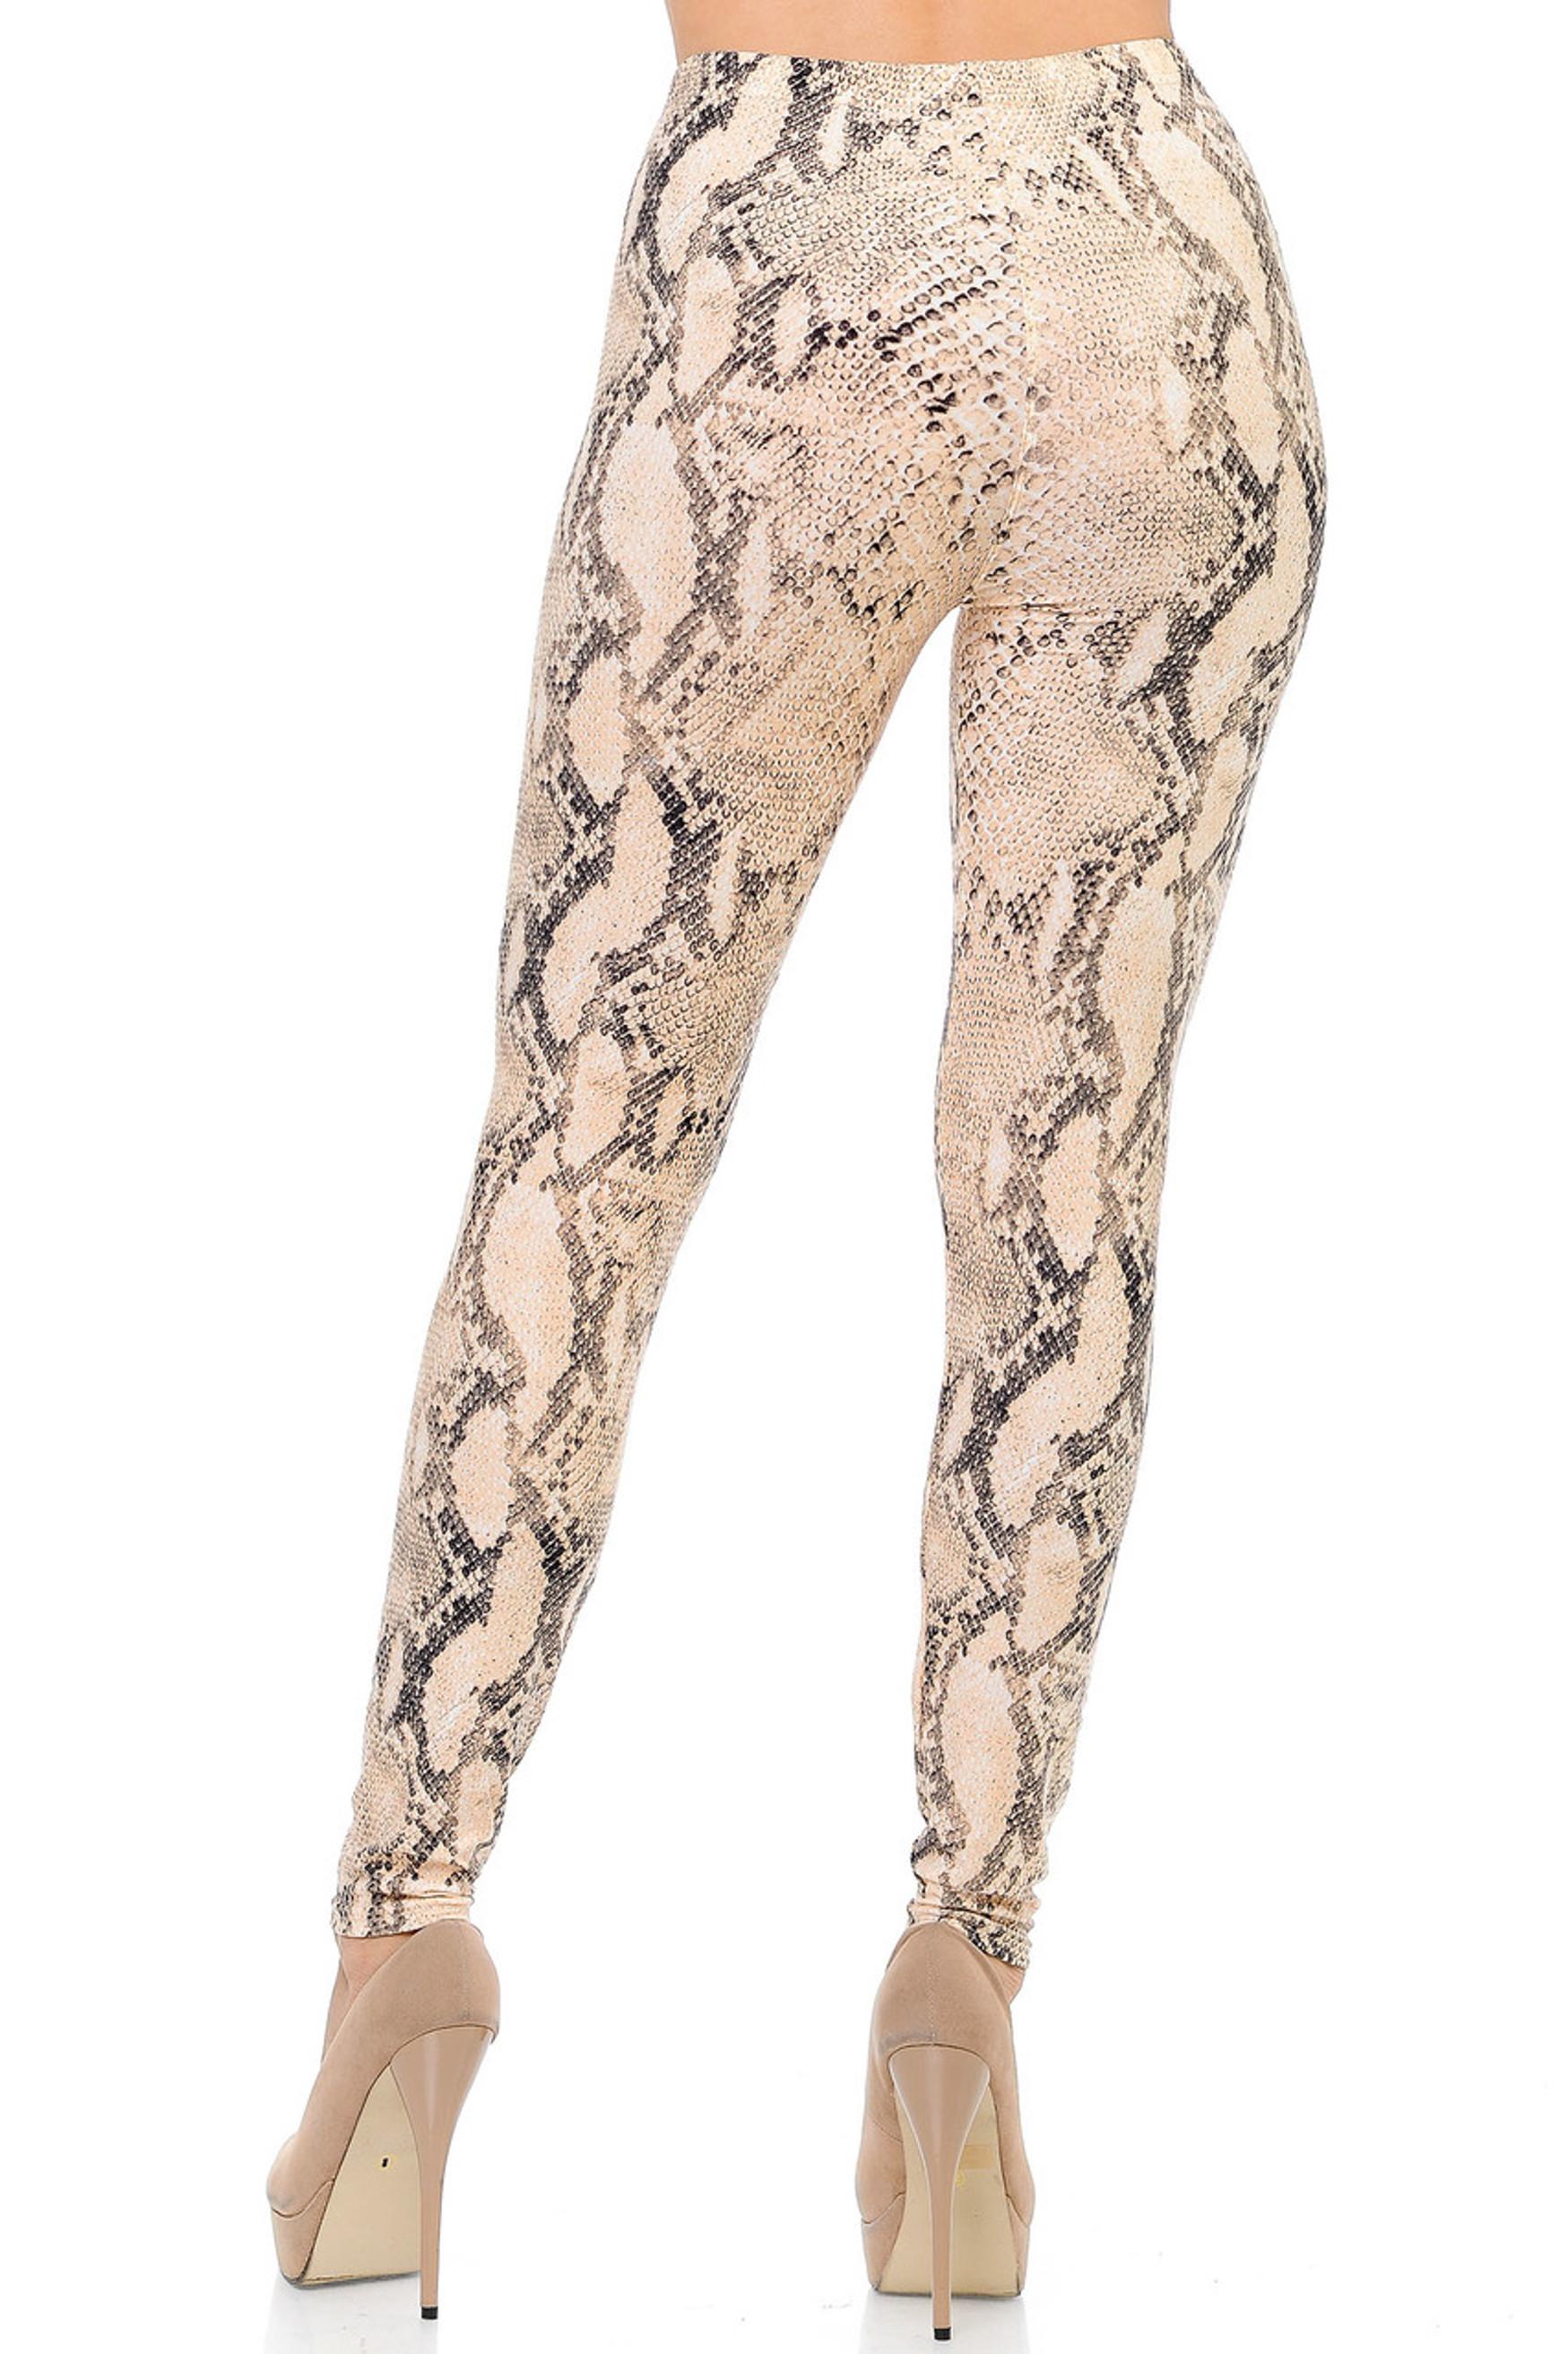 Brushed Cream Snakeskin Plus Size Leggings - 3X-5X